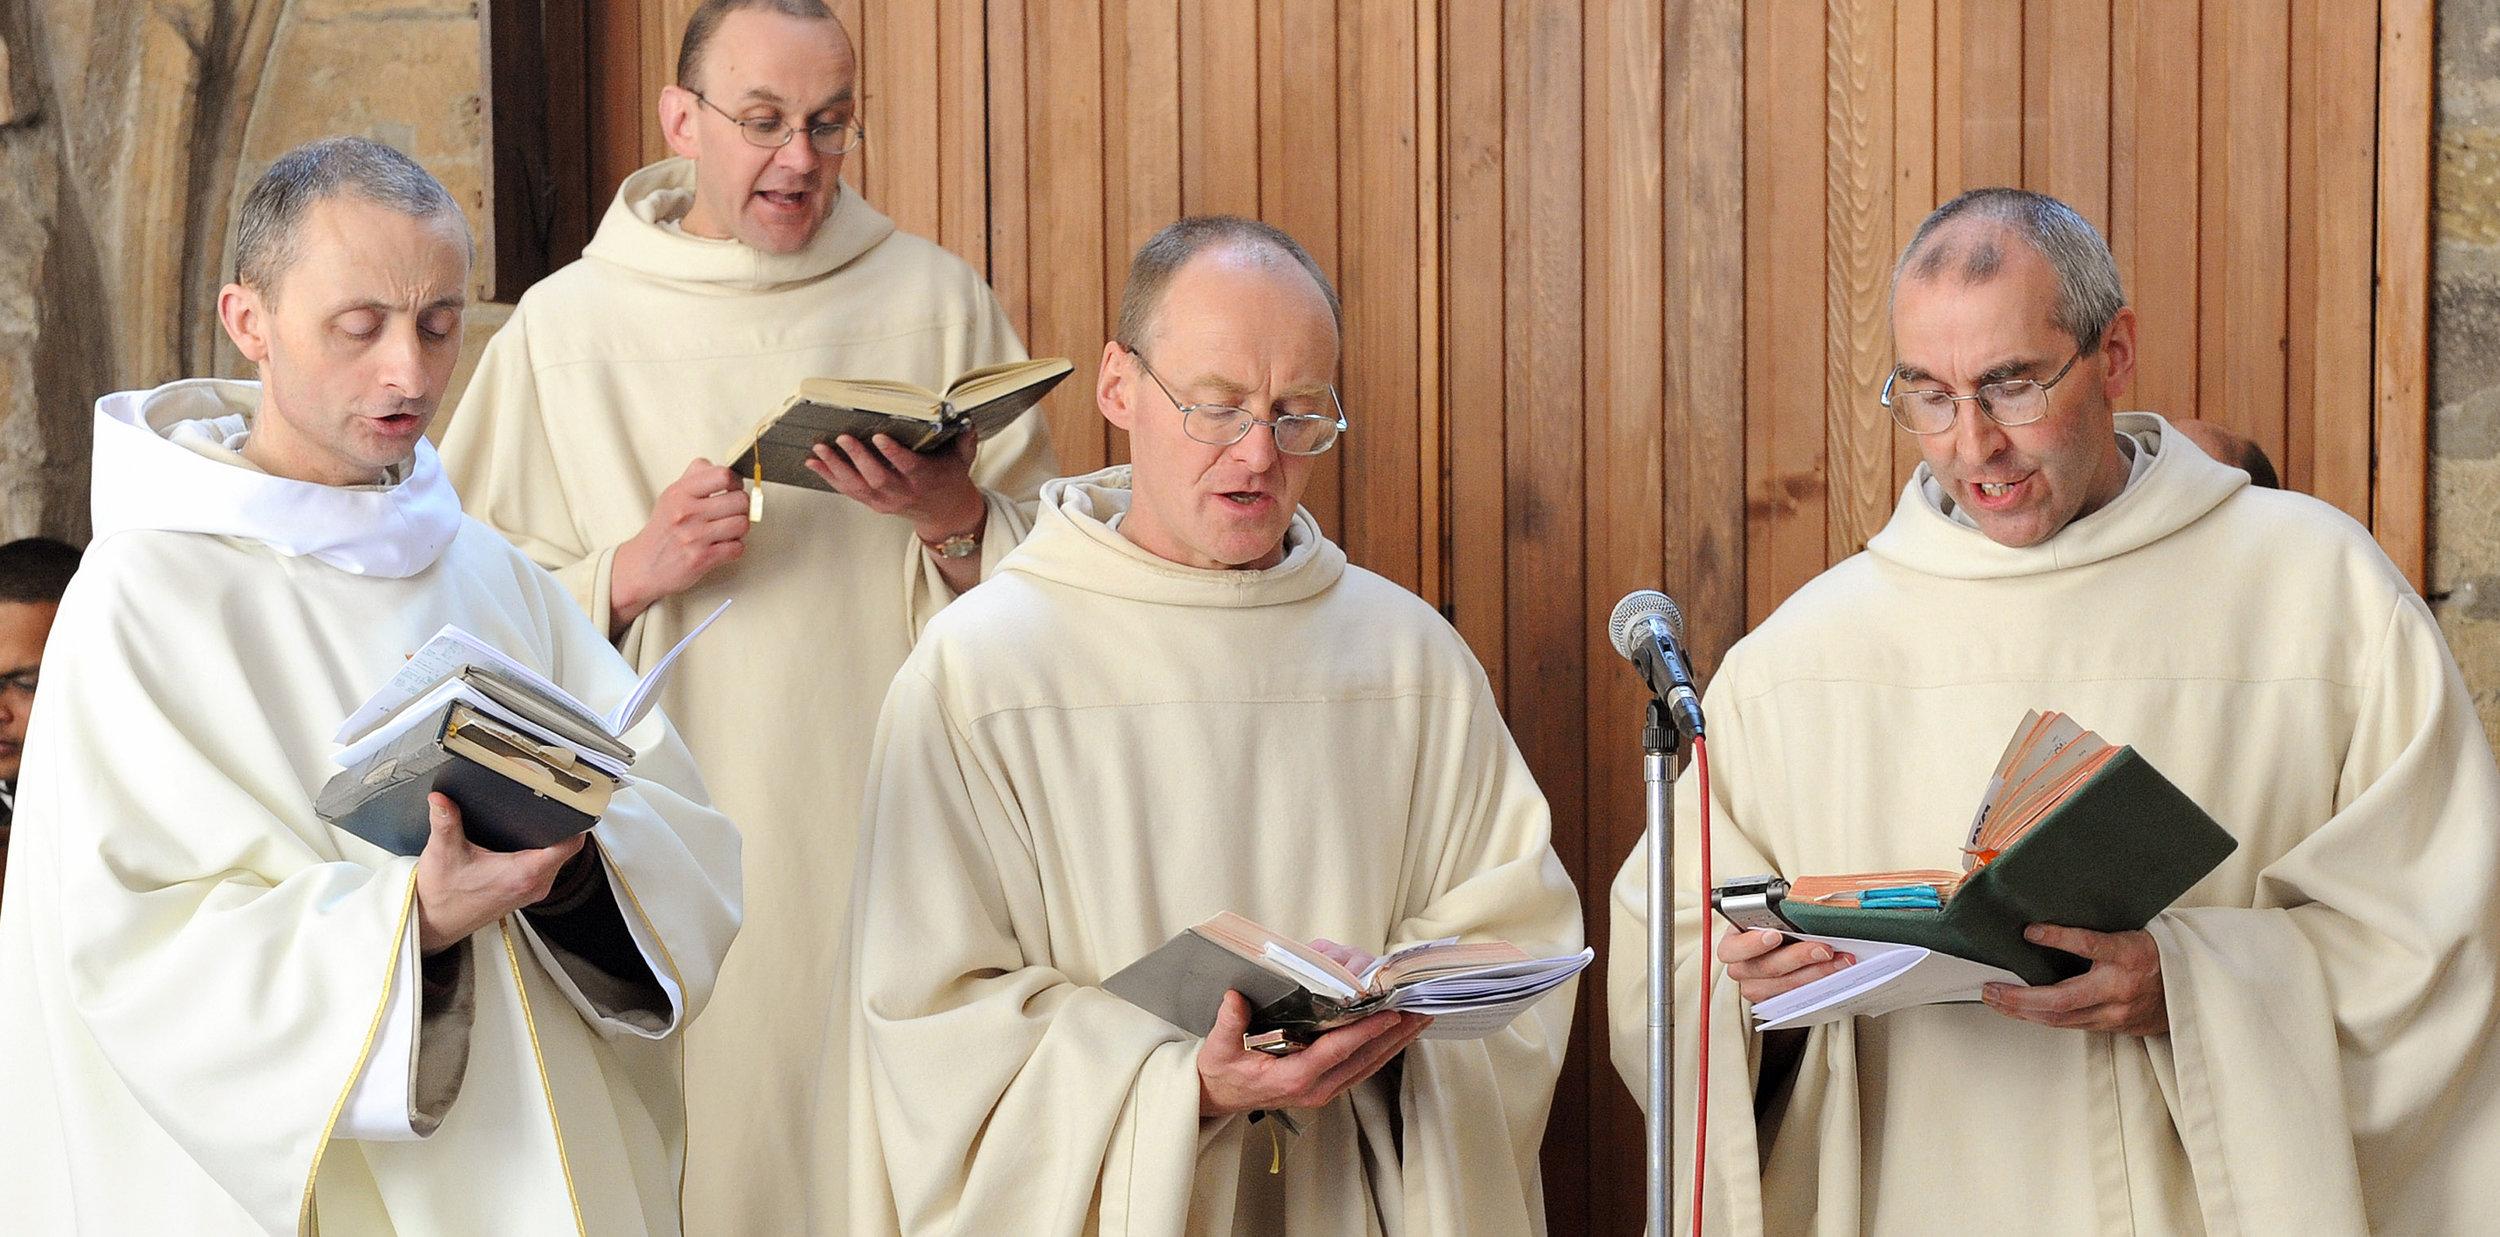 Monks of Pluscarden singing